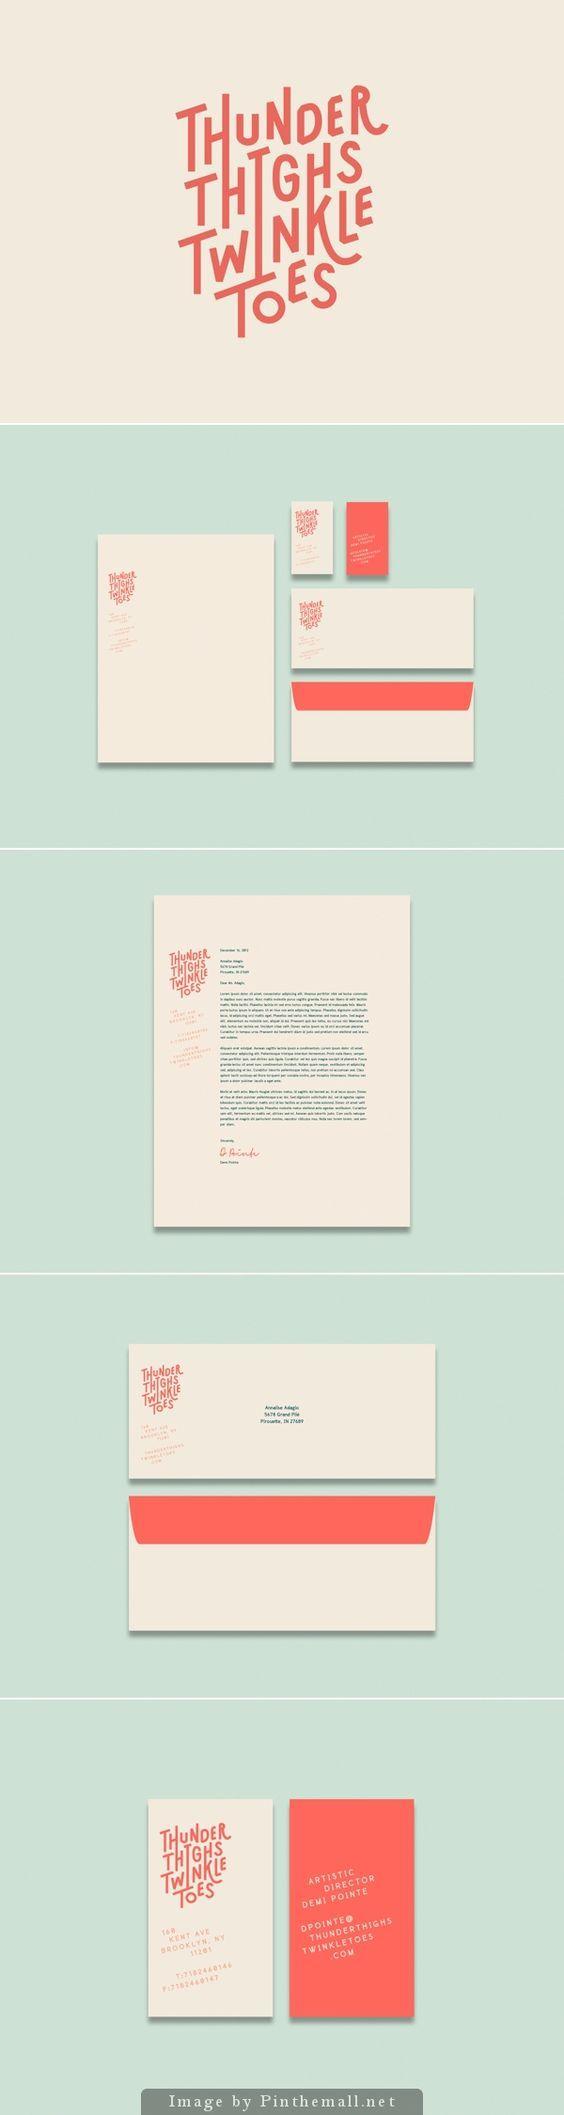 Thunder Thighs Twinkle Toes Branding   Fivestar Branding – Design and Branding Agency & Inspiration Gallery